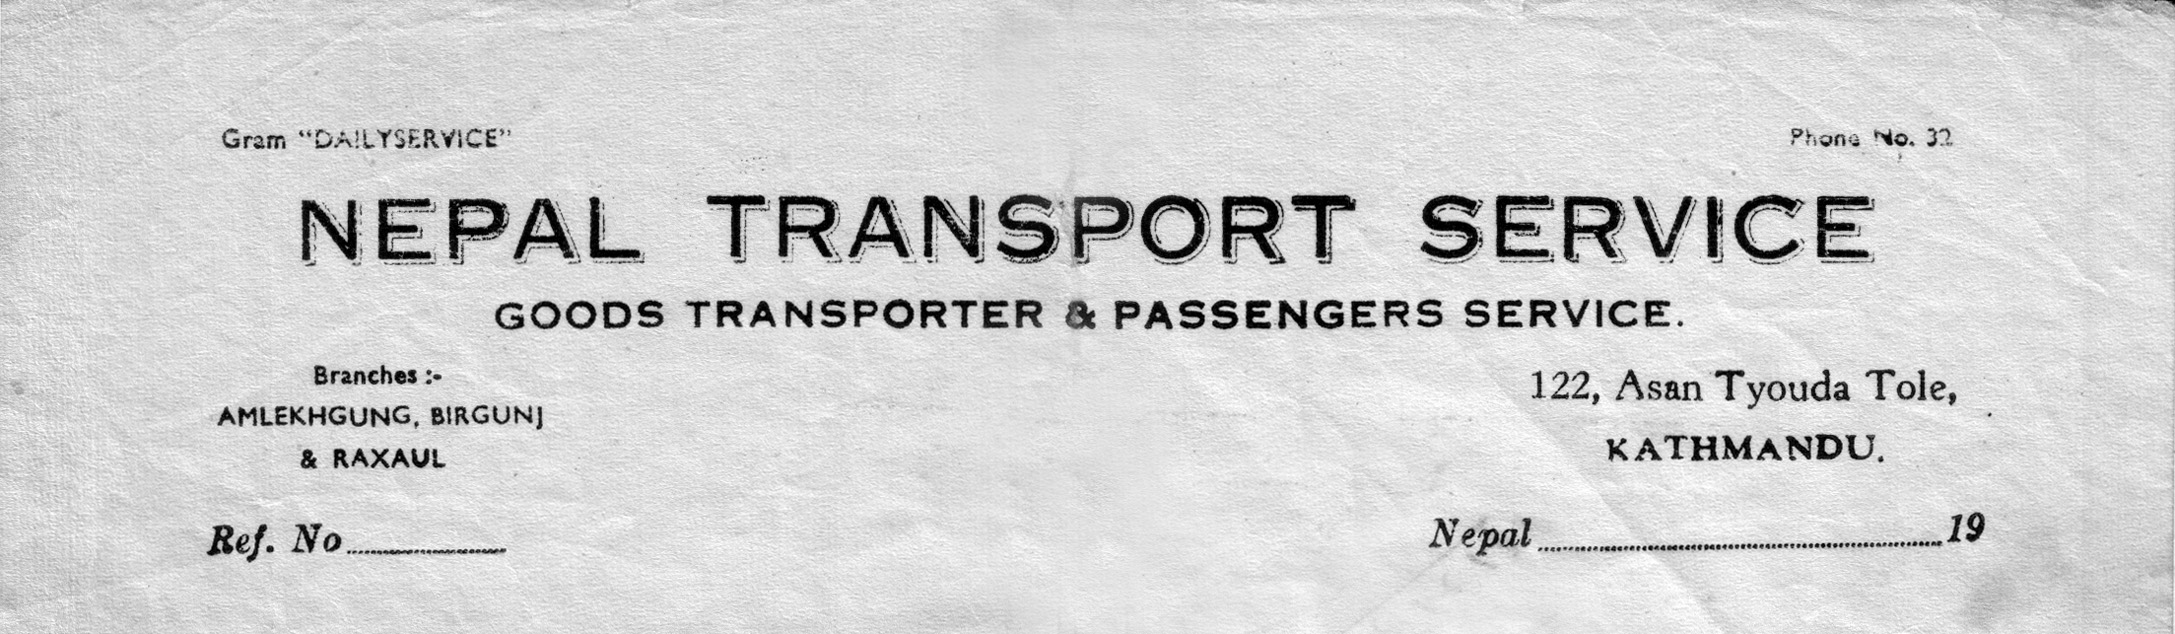 Fileletterhead of nepal transport serviceg wikimedia commons fileletterhead of nepal transport serviceg spiritdancerdesigns Gallery